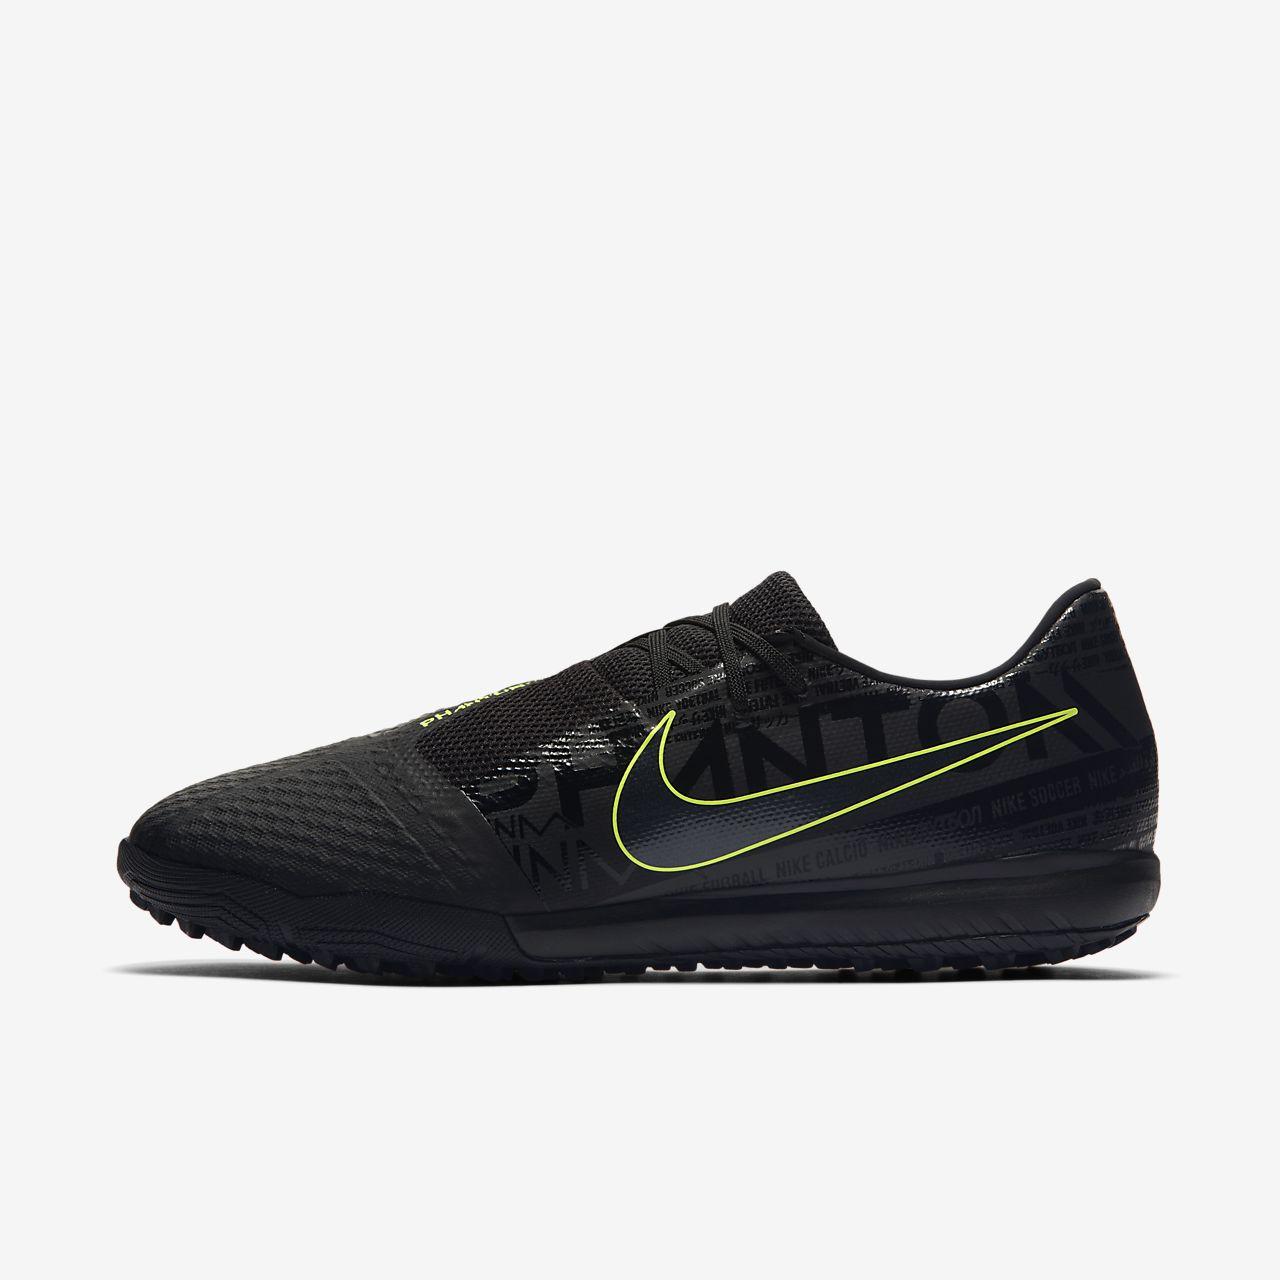 Scarpa da calcio per erba sintetica Nike Phantom Venom Academy TF